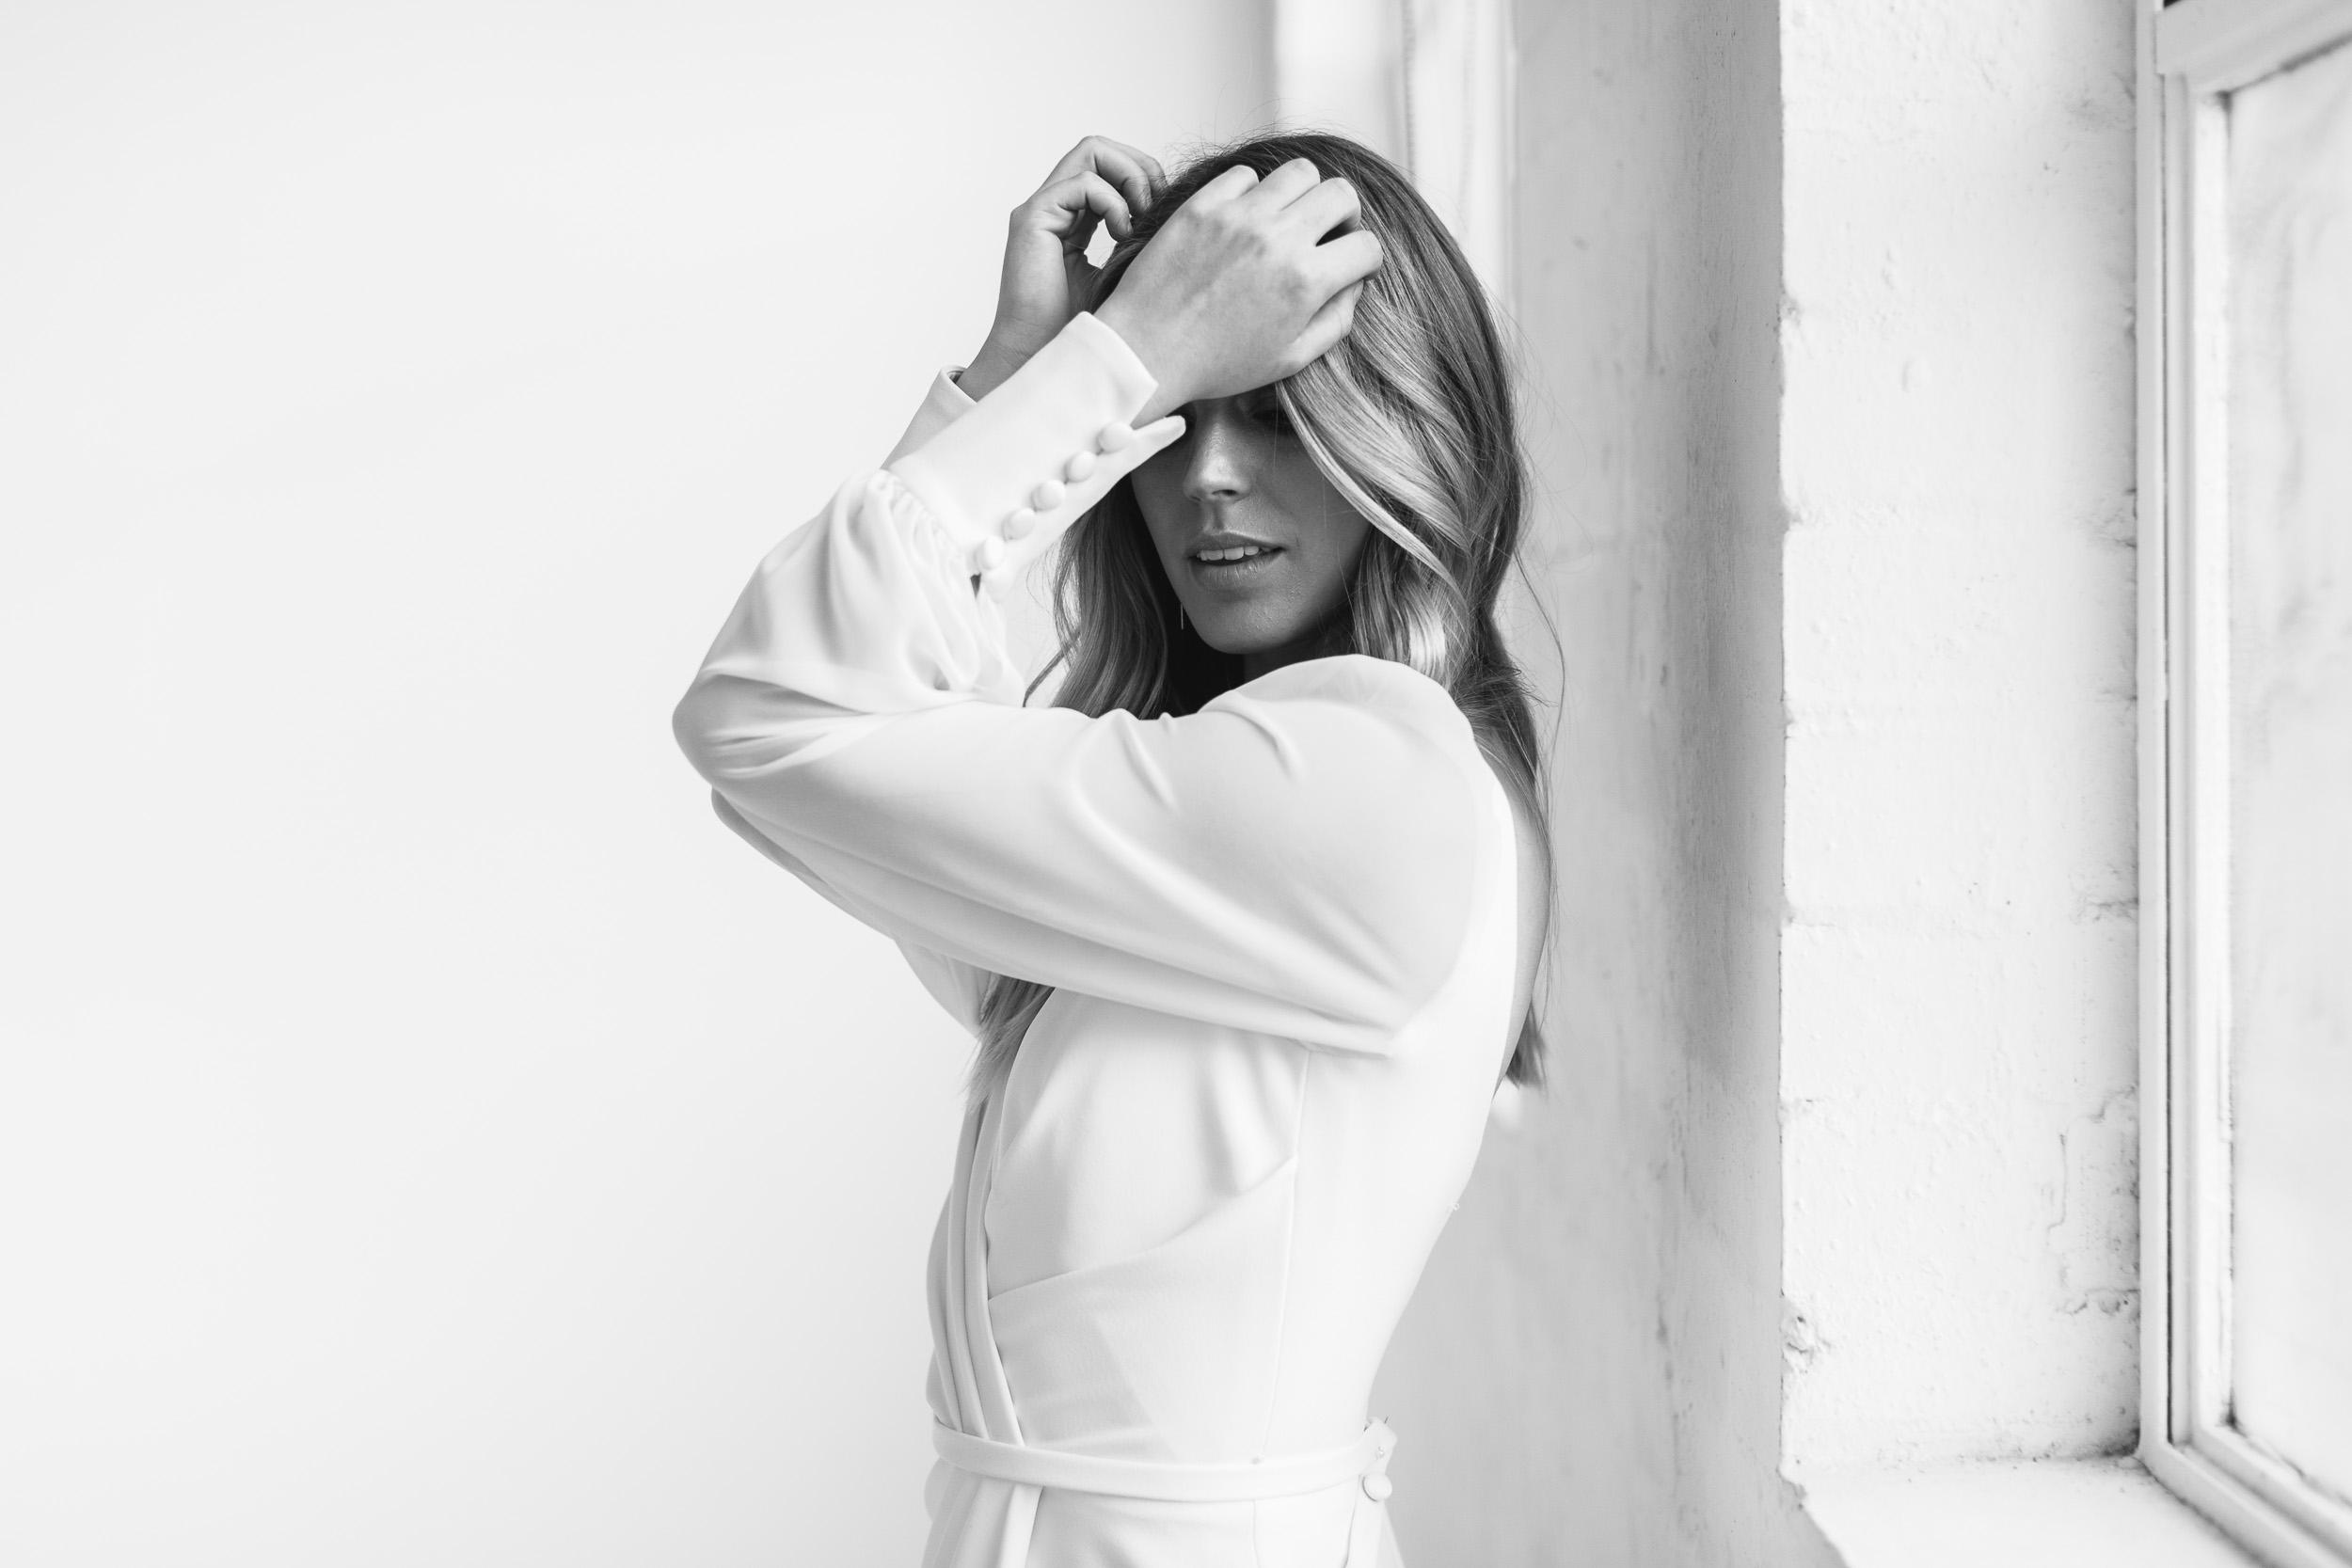 Kas-Richards-Karen-Willis_Holmes-Bridal-Wild-Hearts-Collection-223.jpg